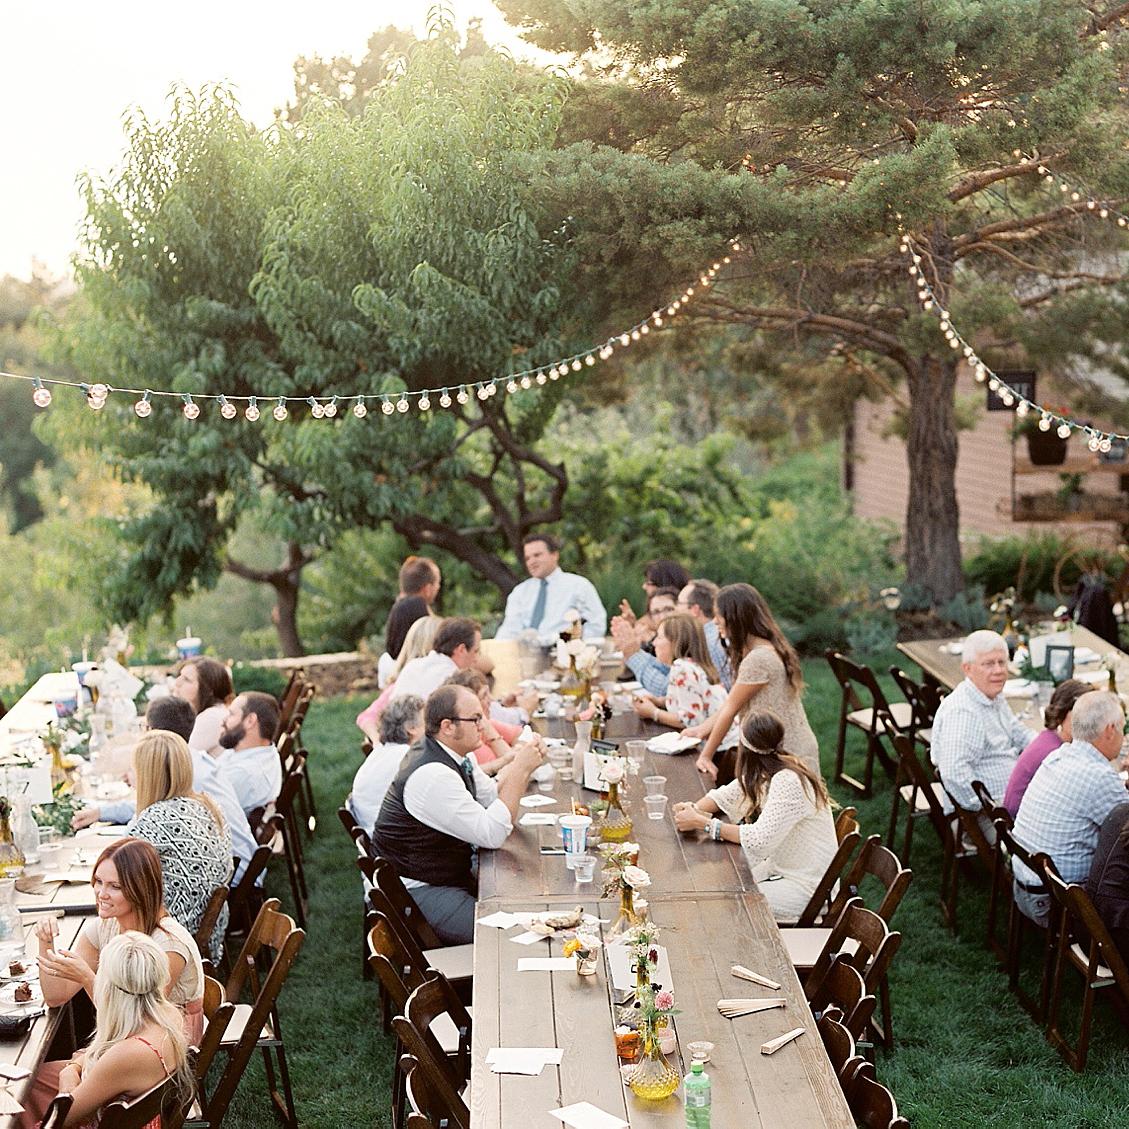 Kim & Alex - LDS Temple &Backyard Wedding